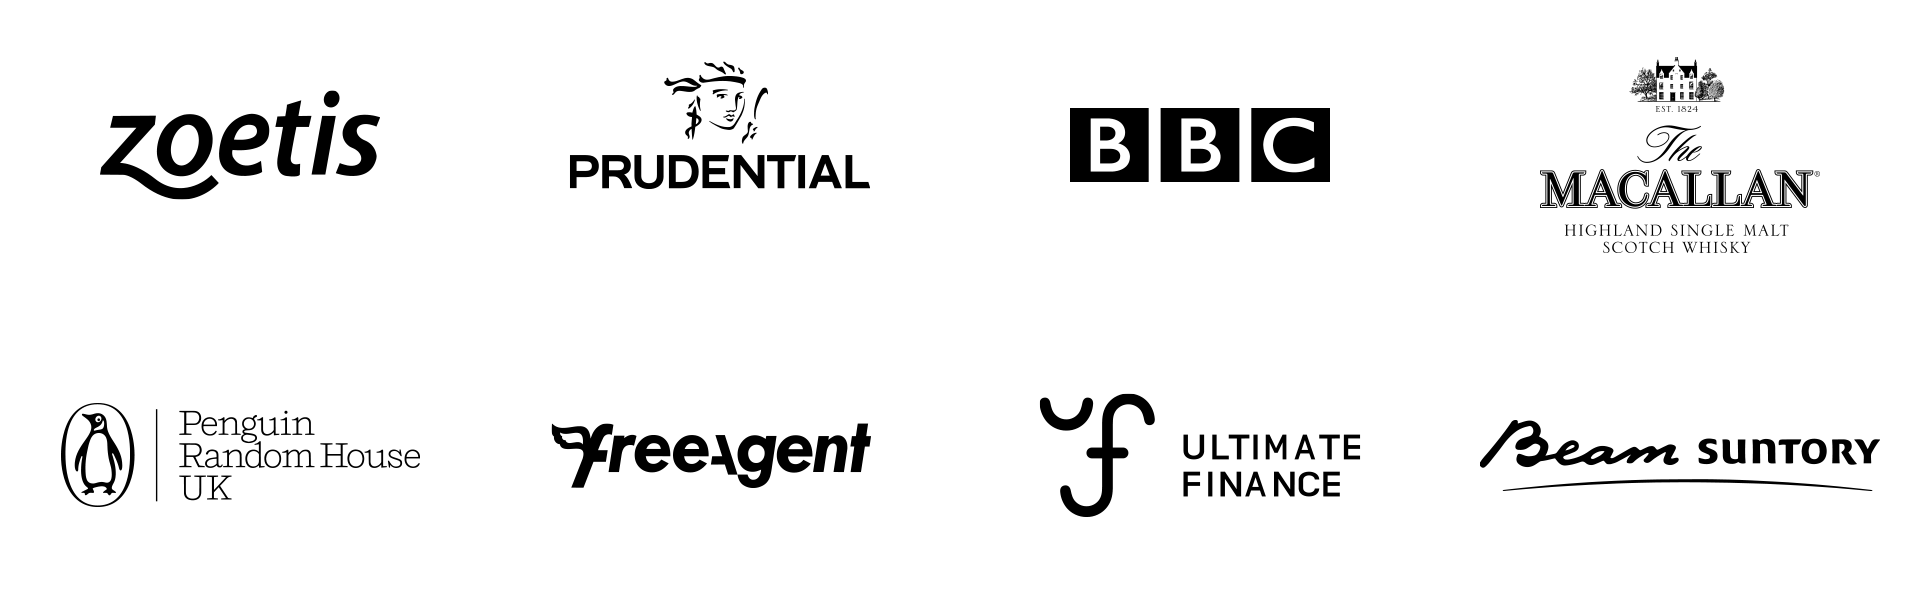 Homepage-Logos.png